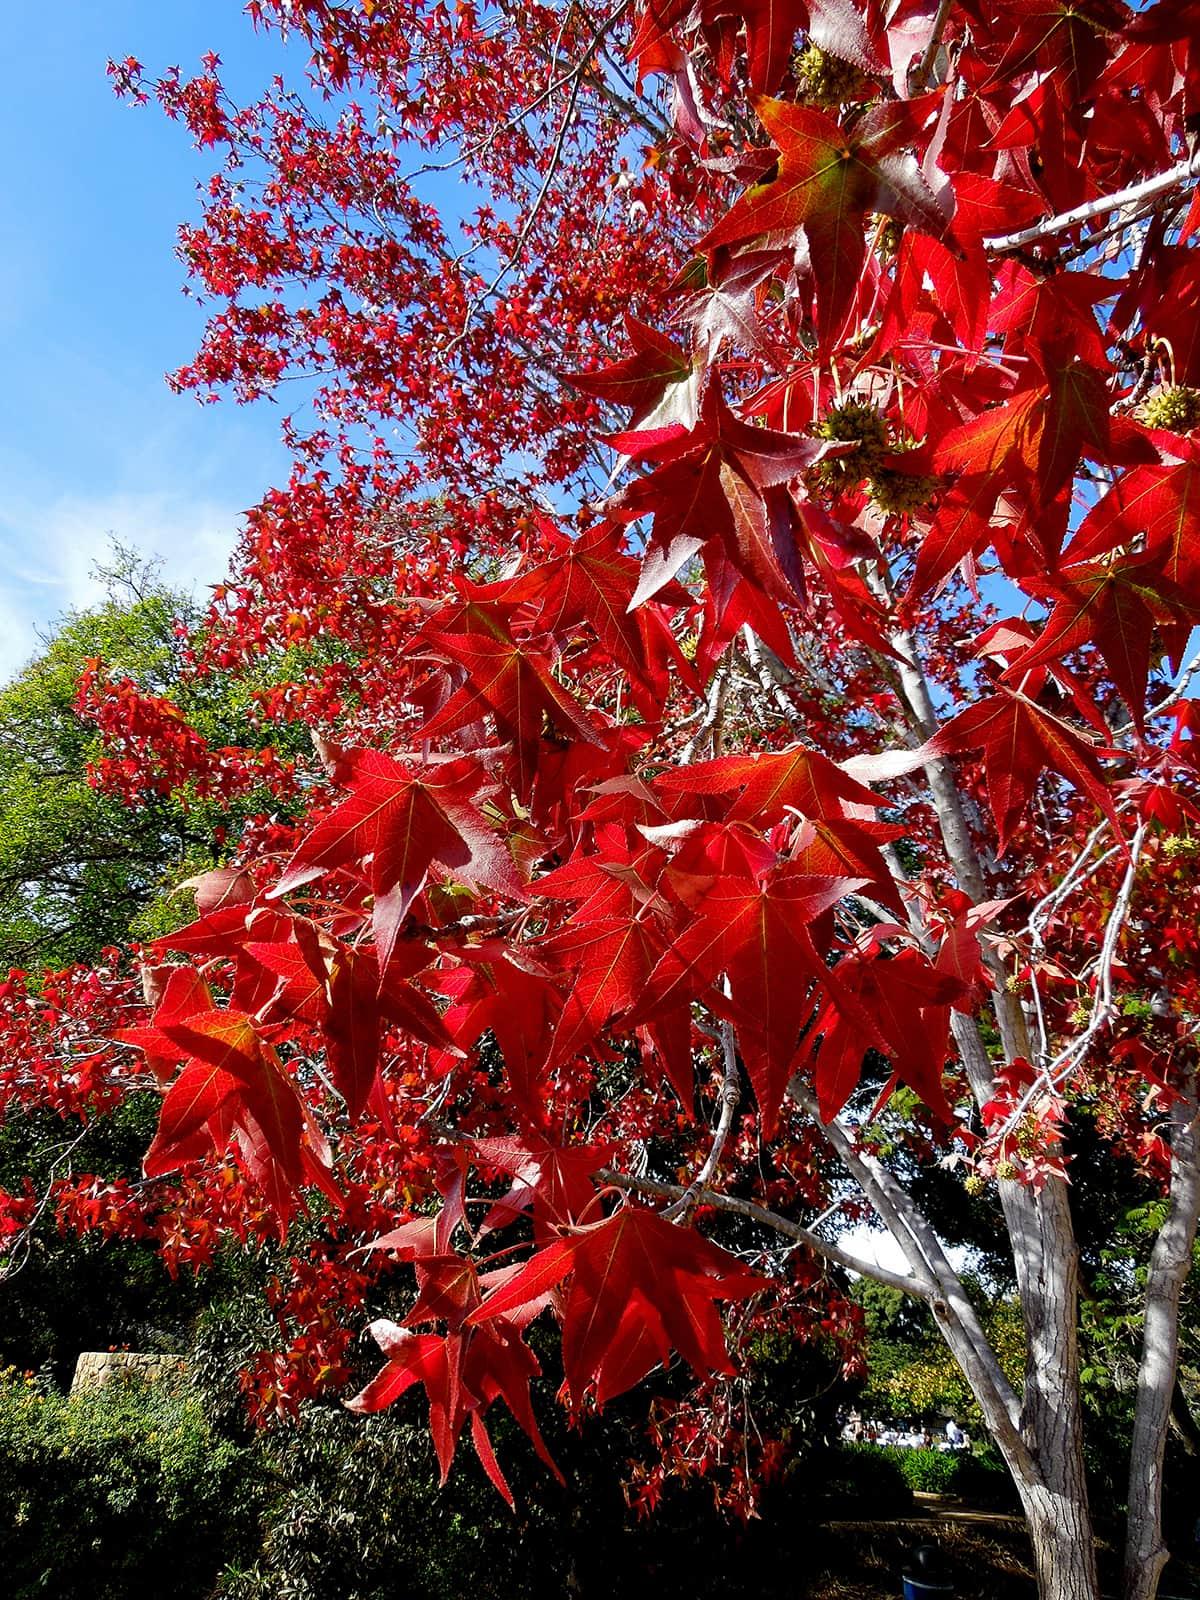 Liquidambar Tree Dec 2016